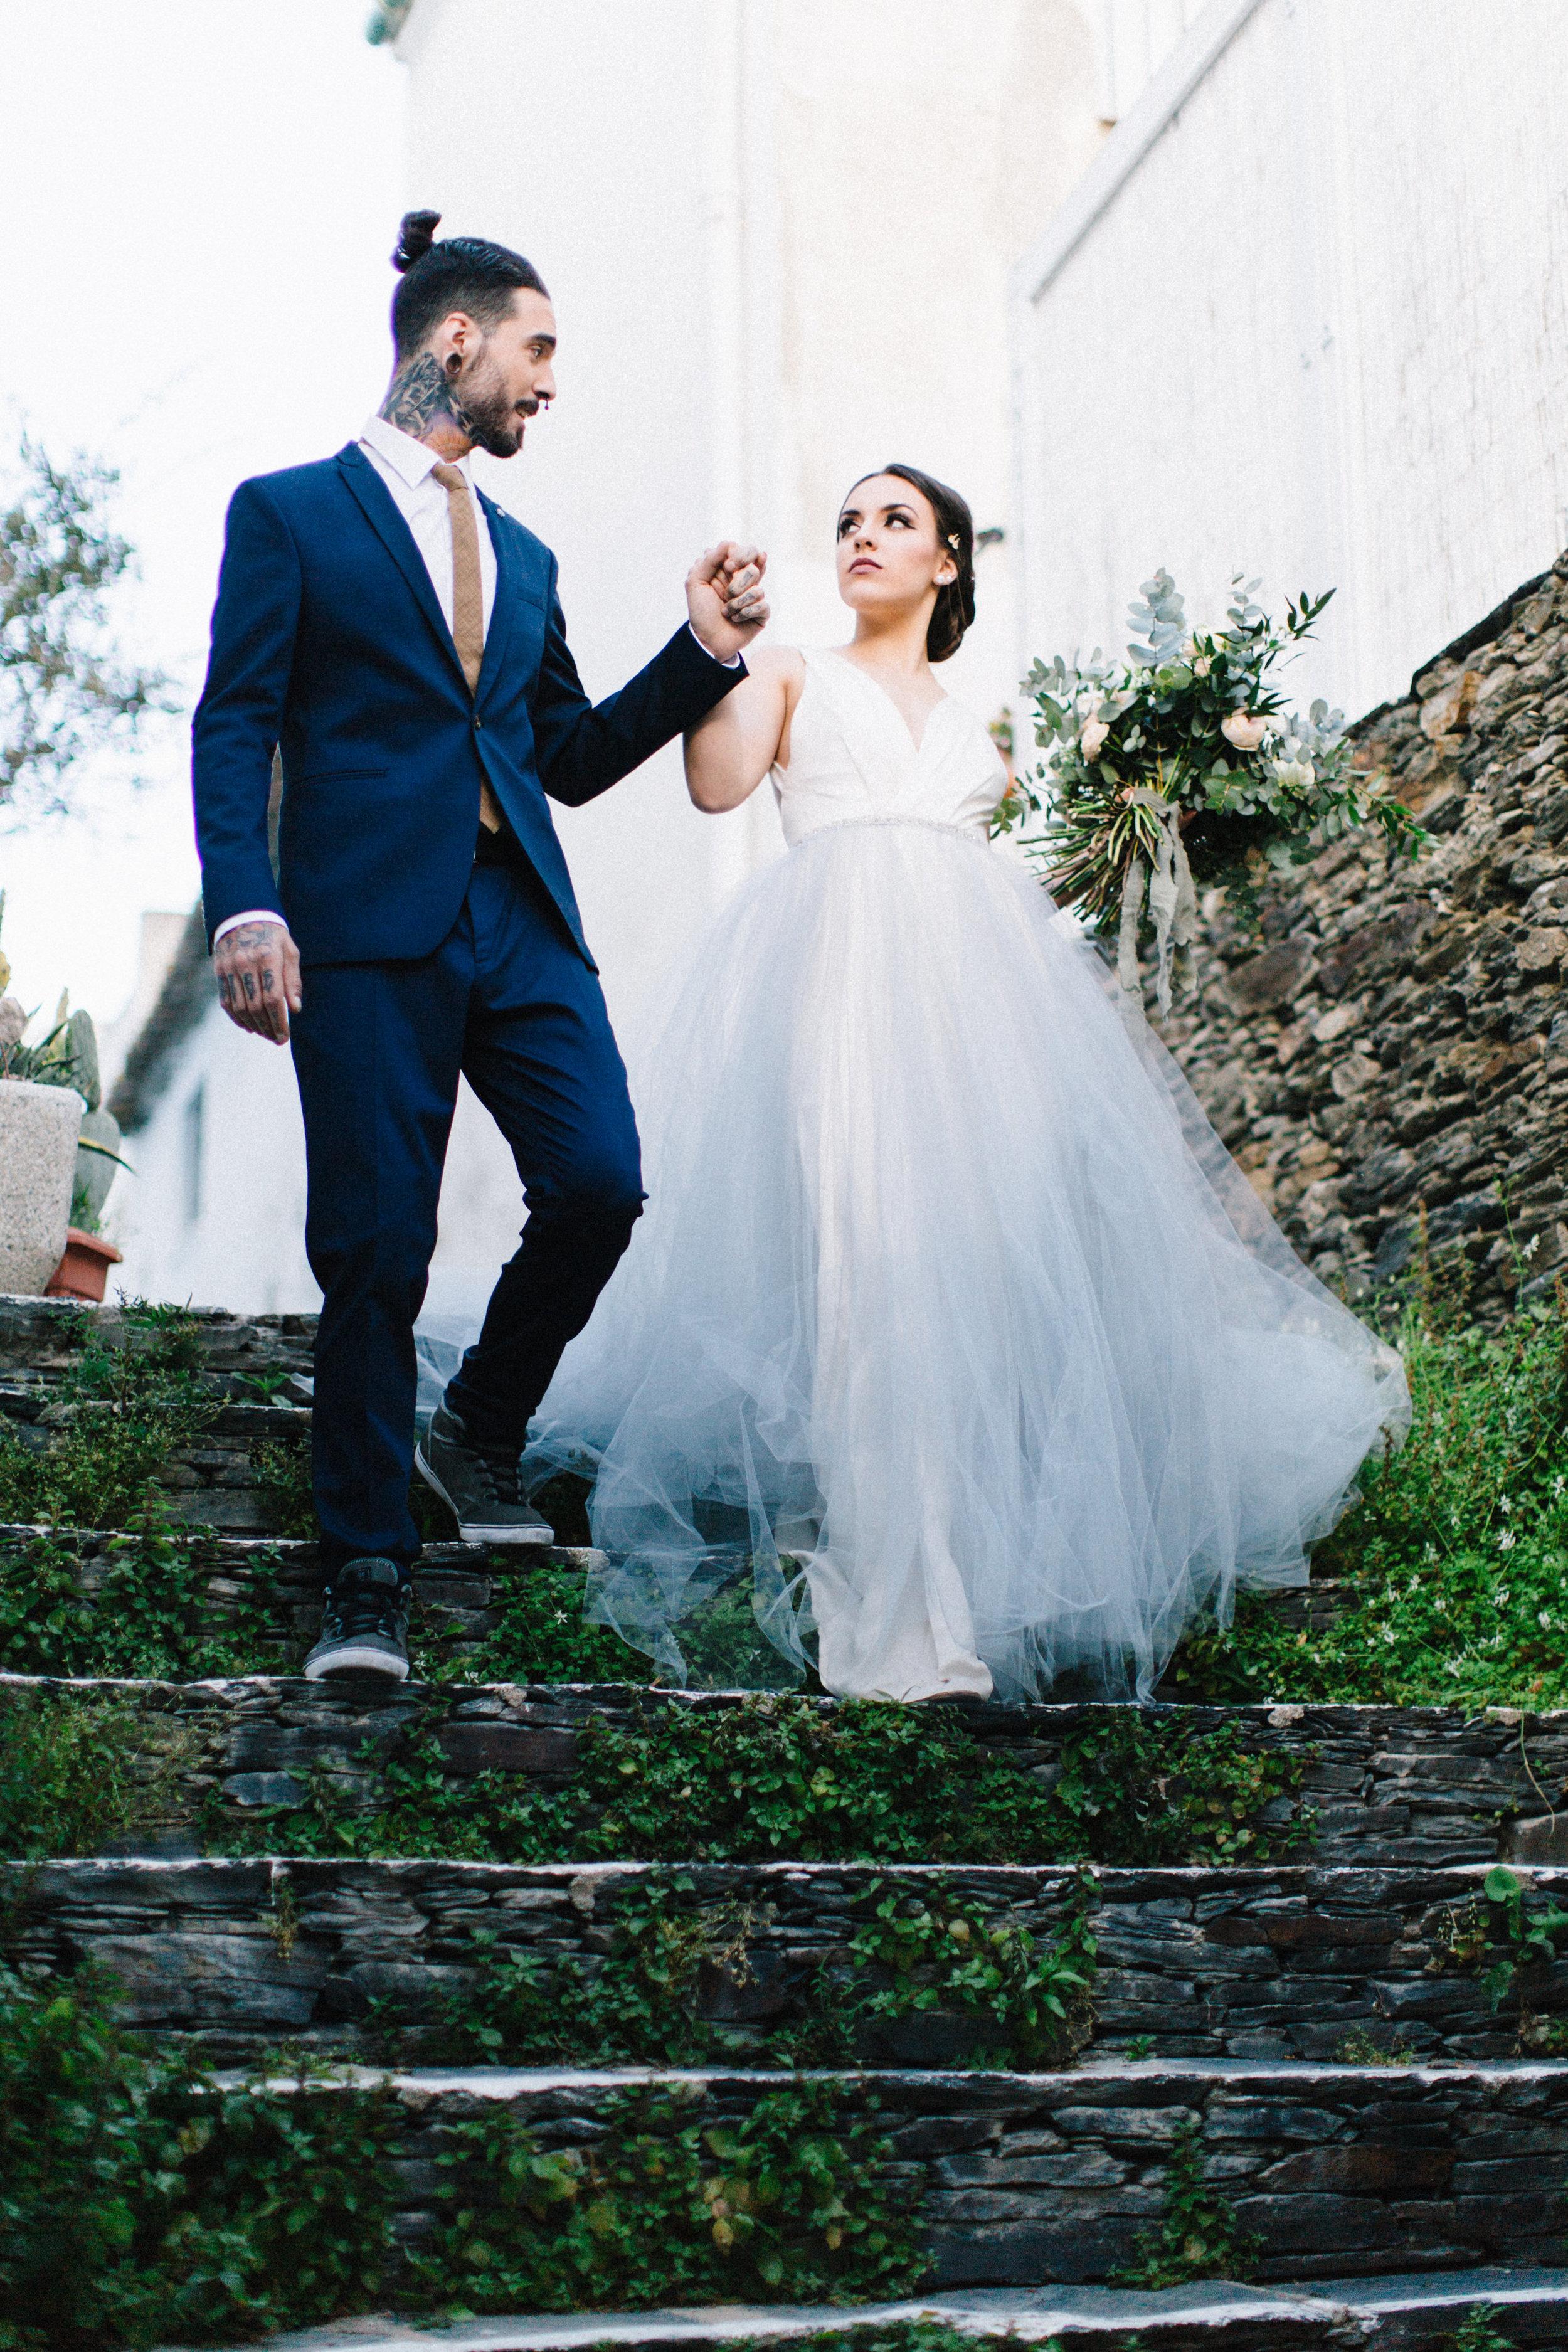 Cadaques Wedding Inspiration   Four Corners Photography   Joy Wed   http://www.joy-wed.com